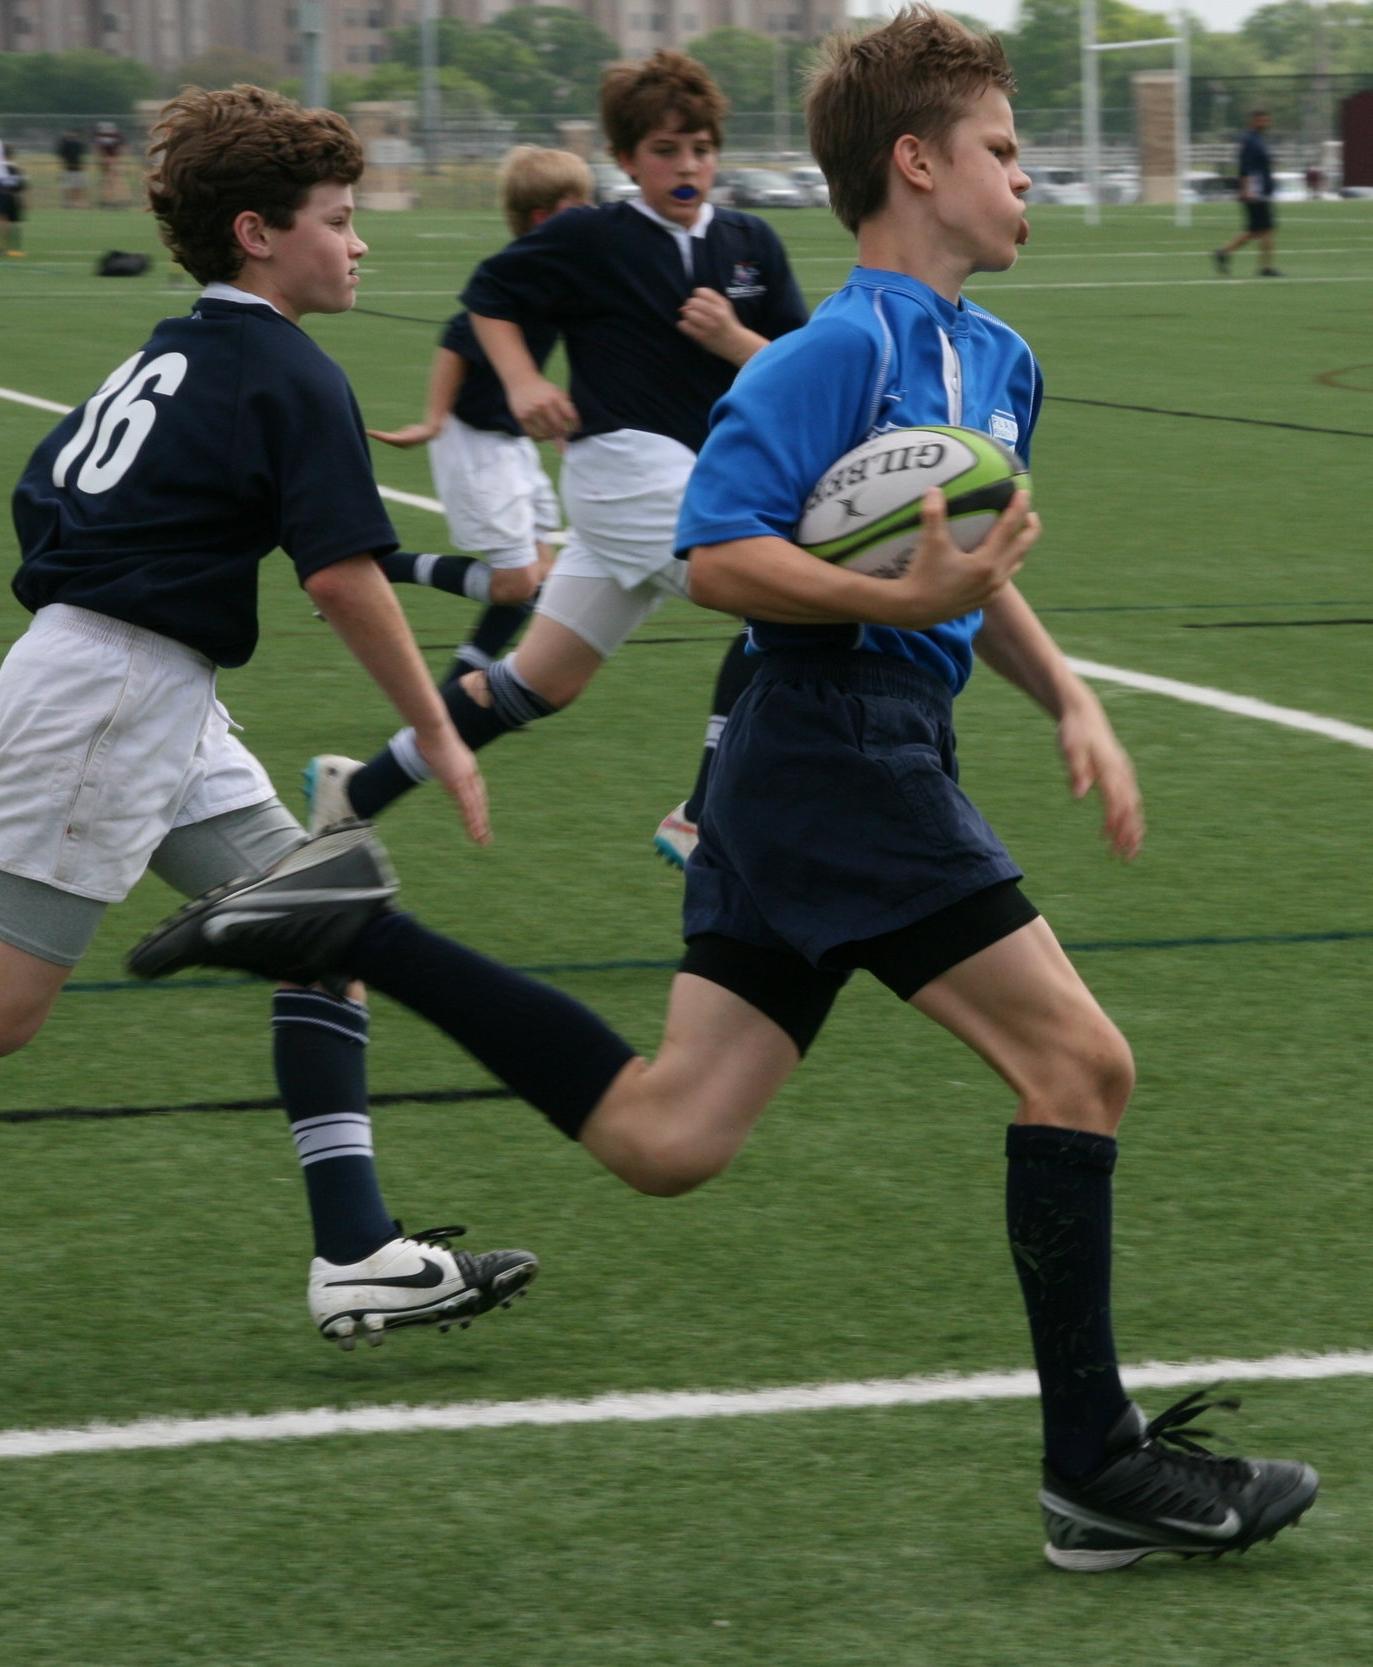 Gareth Jones Rugby Challenge